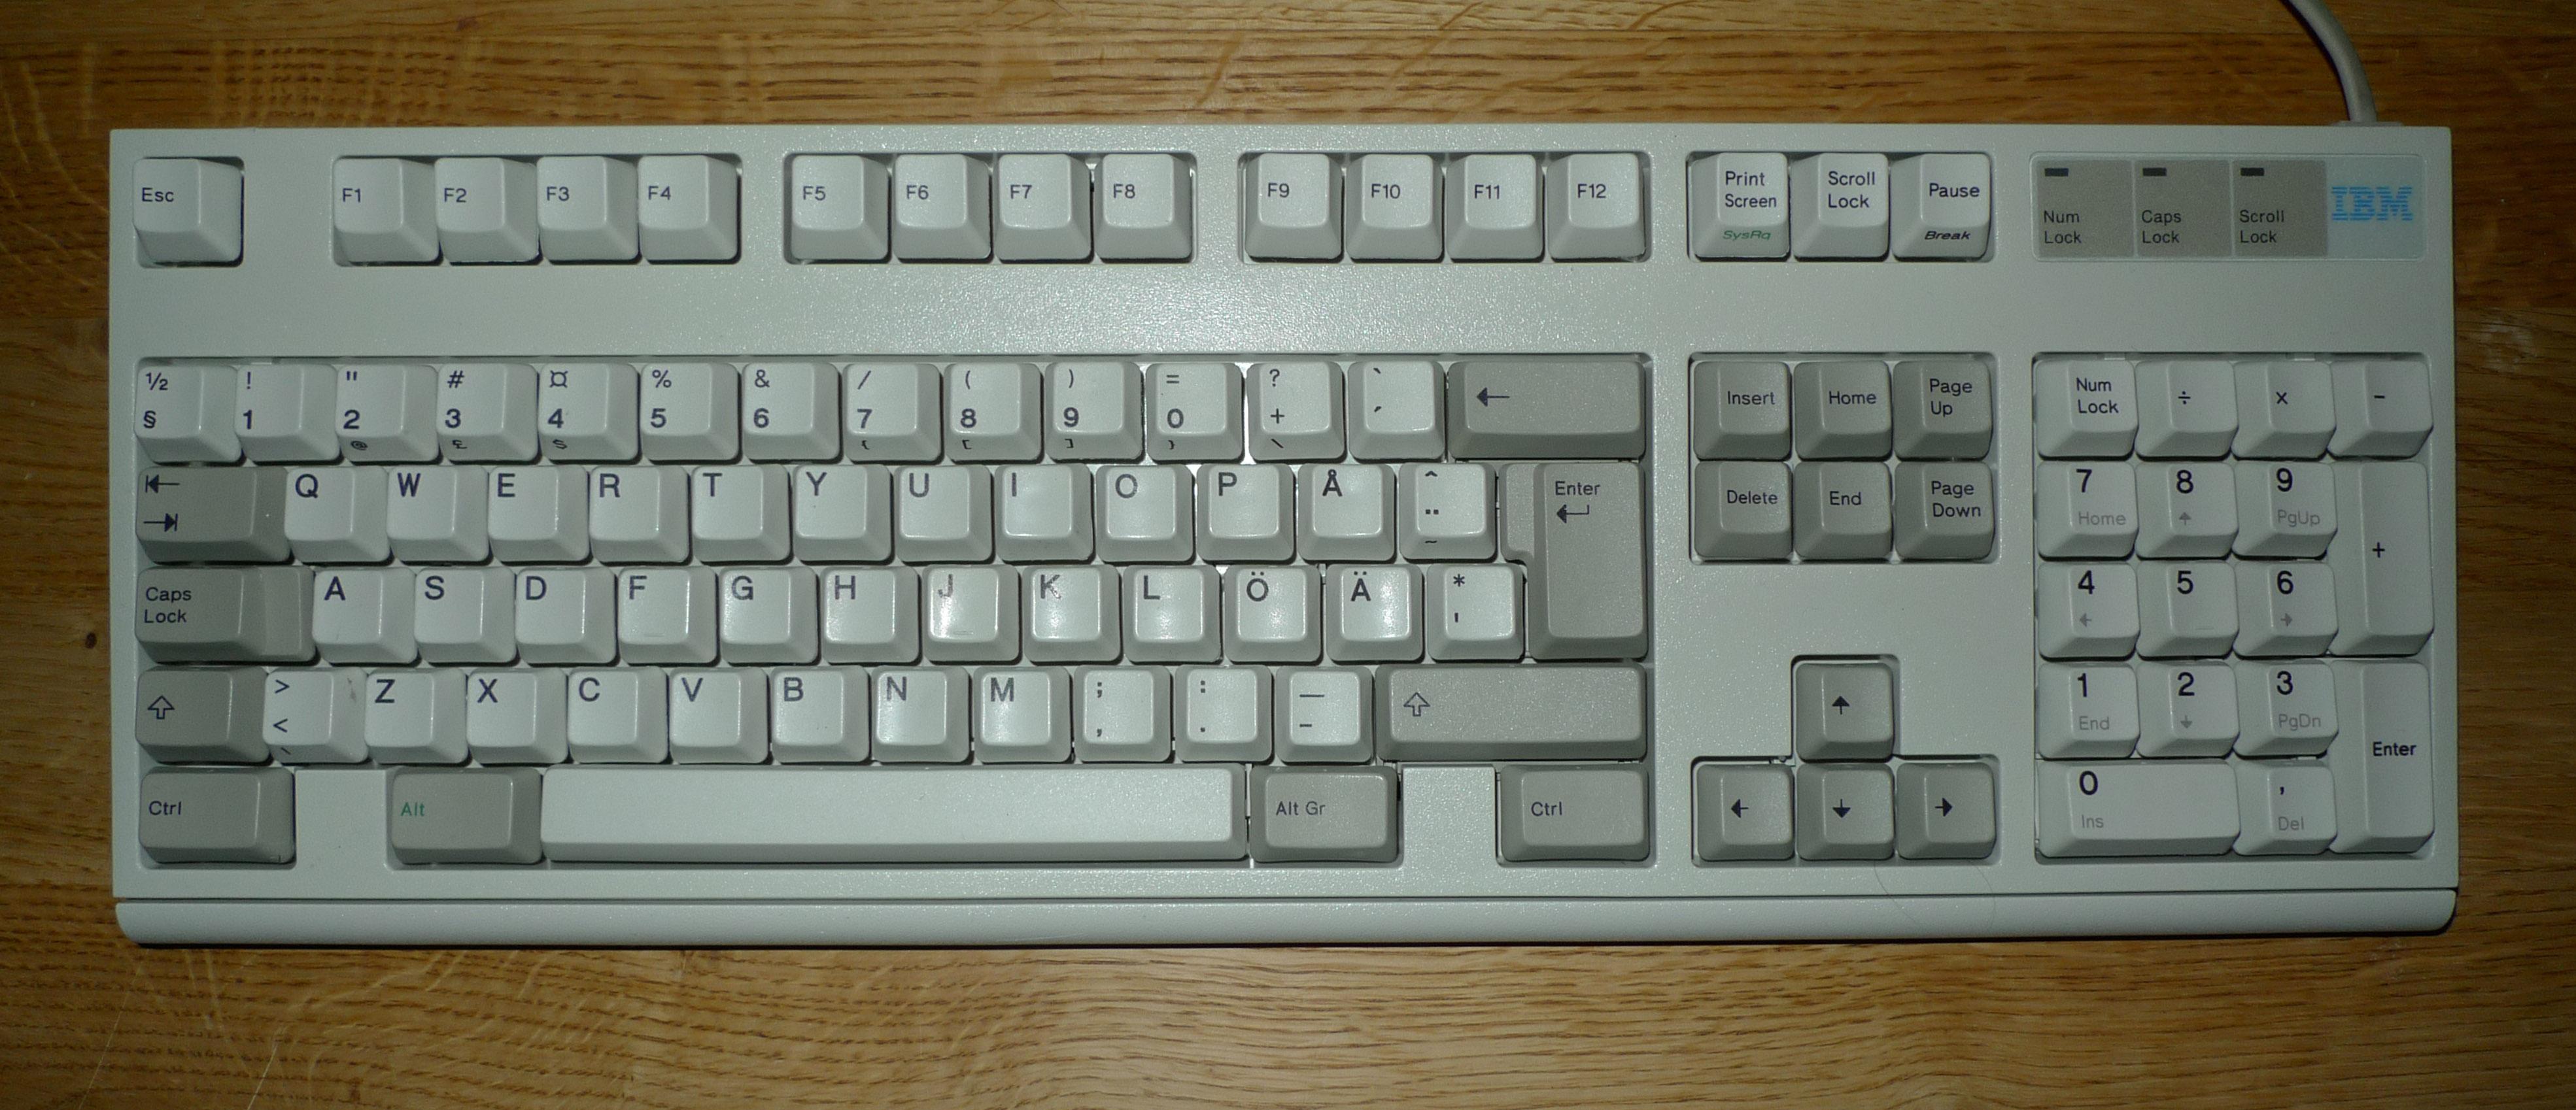 IBM Model M keyboard, Unicomp